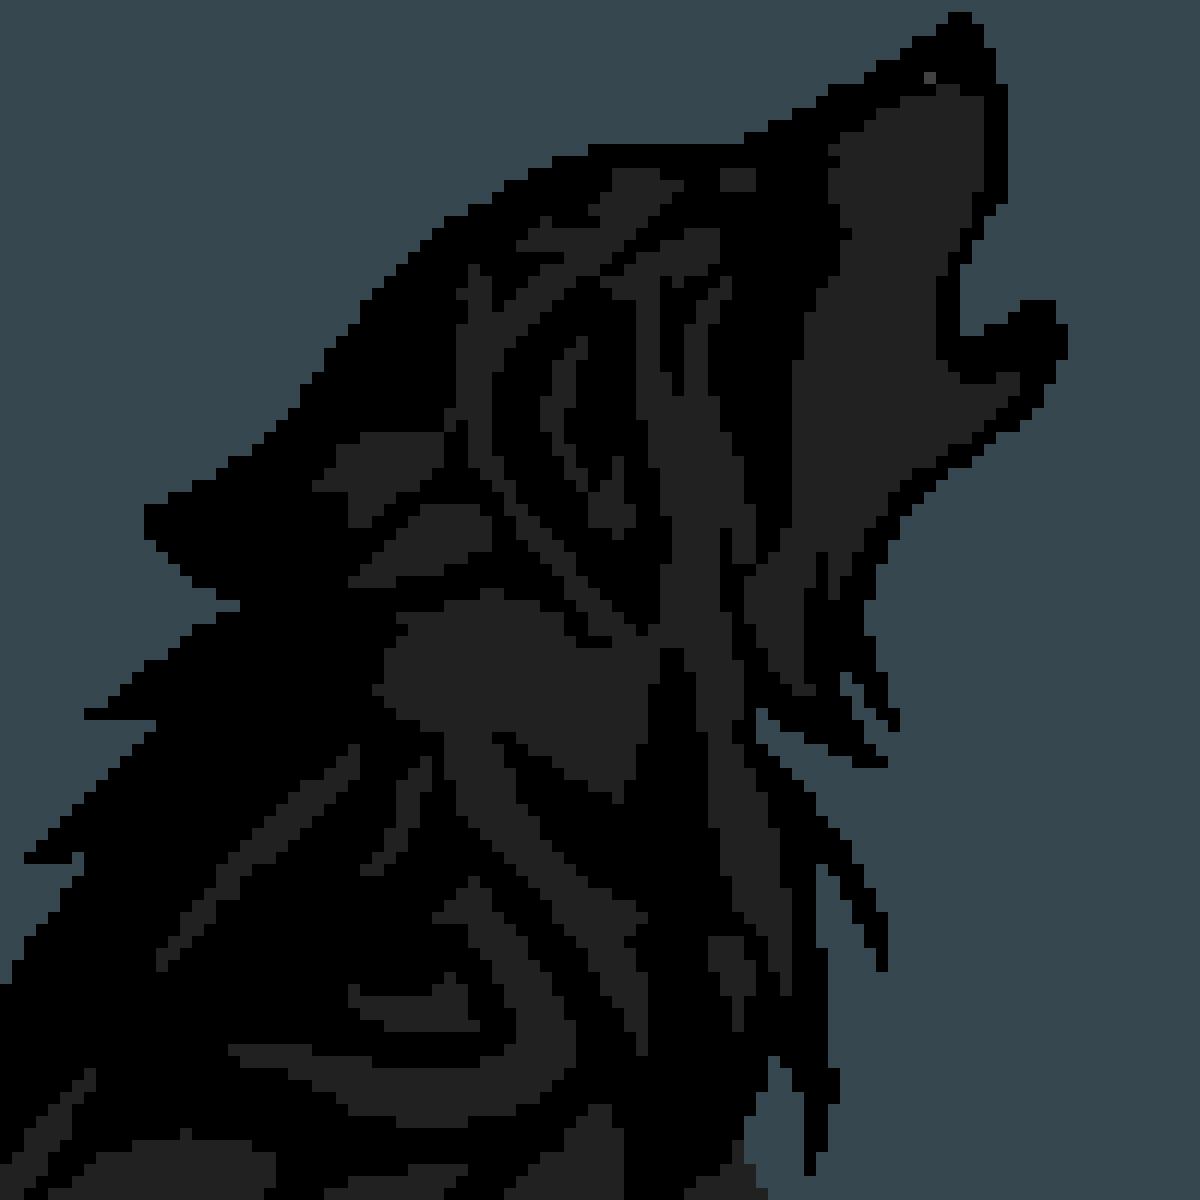 wolf by broadd2511